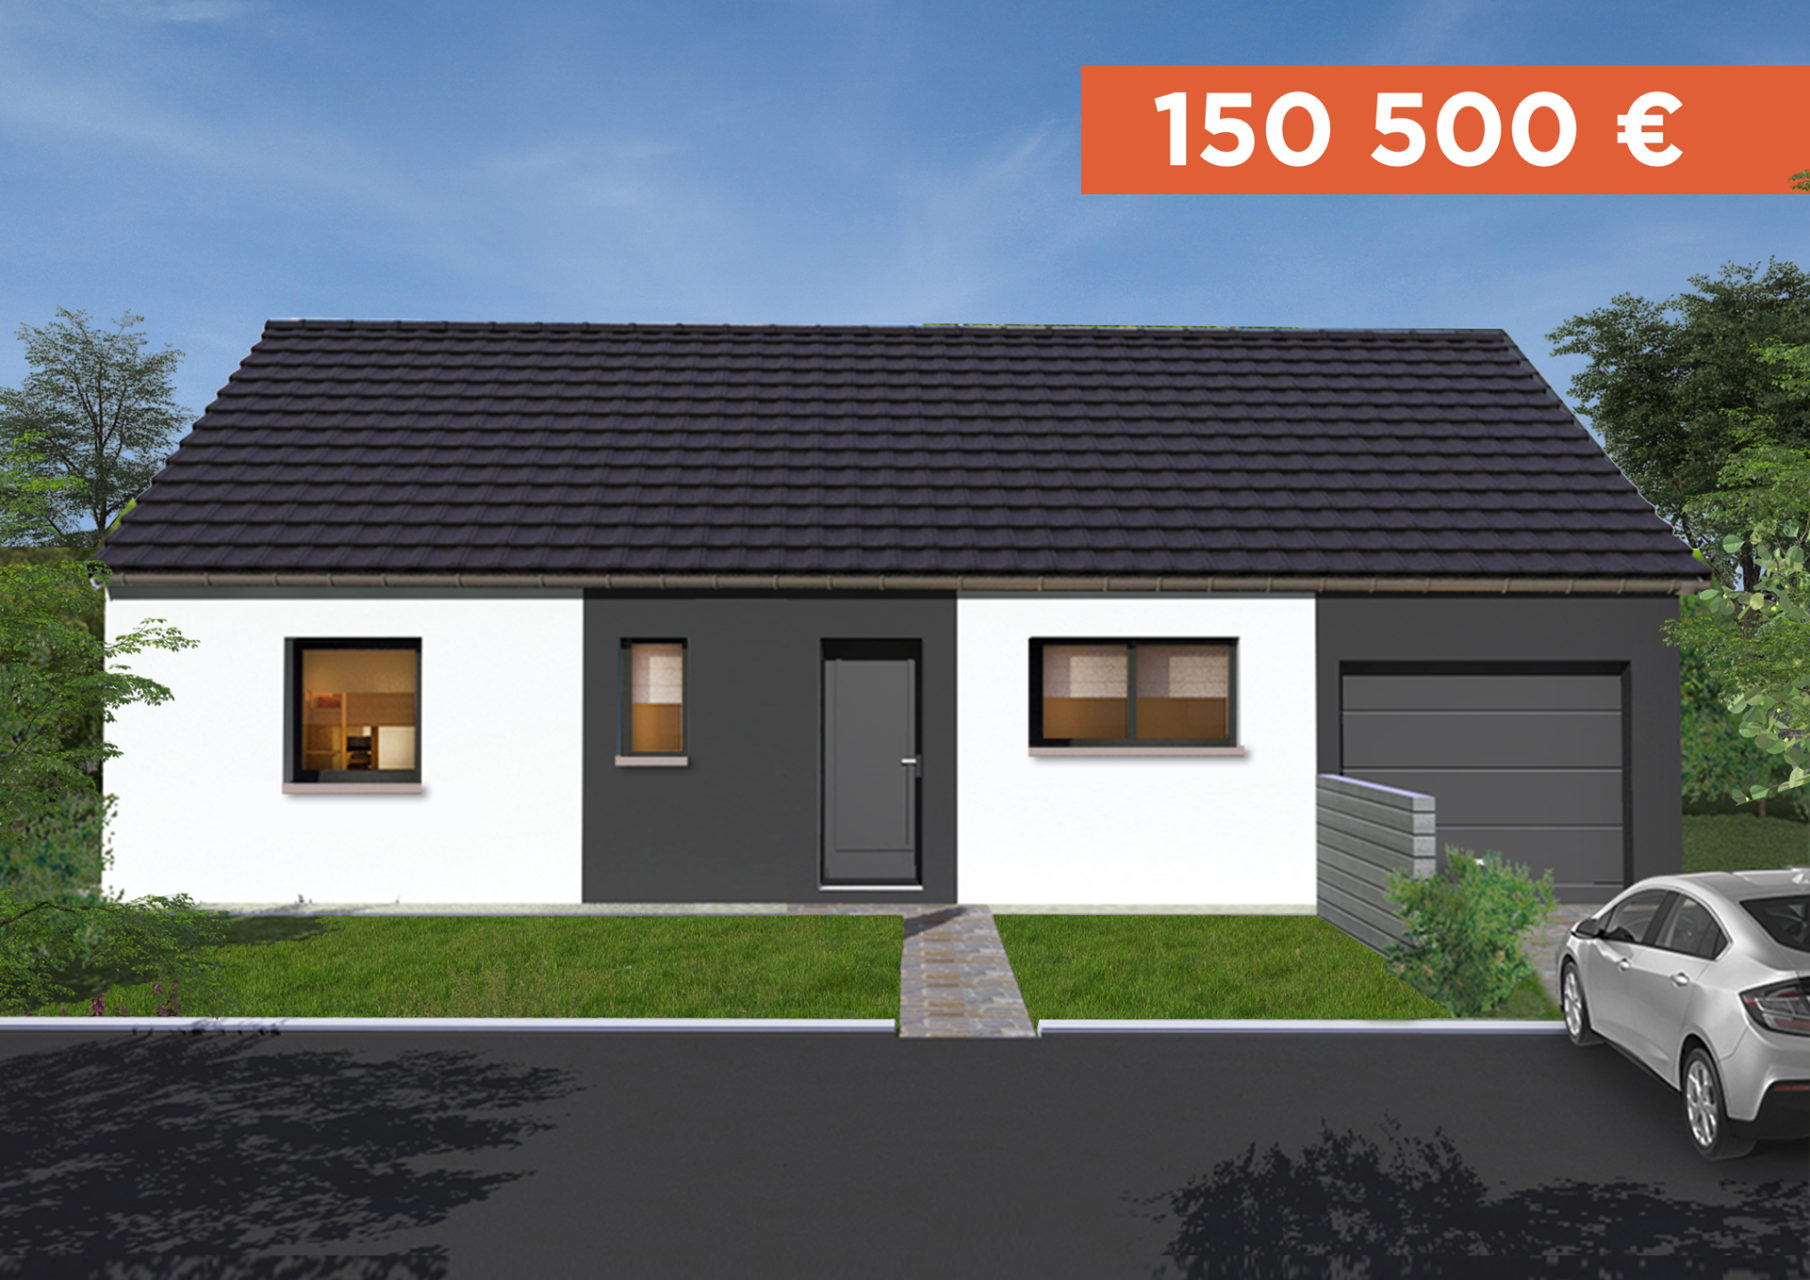 maison start avec garage et terrain varennes le grand en sa ne et loire. Black Bedroom Furniture Sets. Home Design Ideas